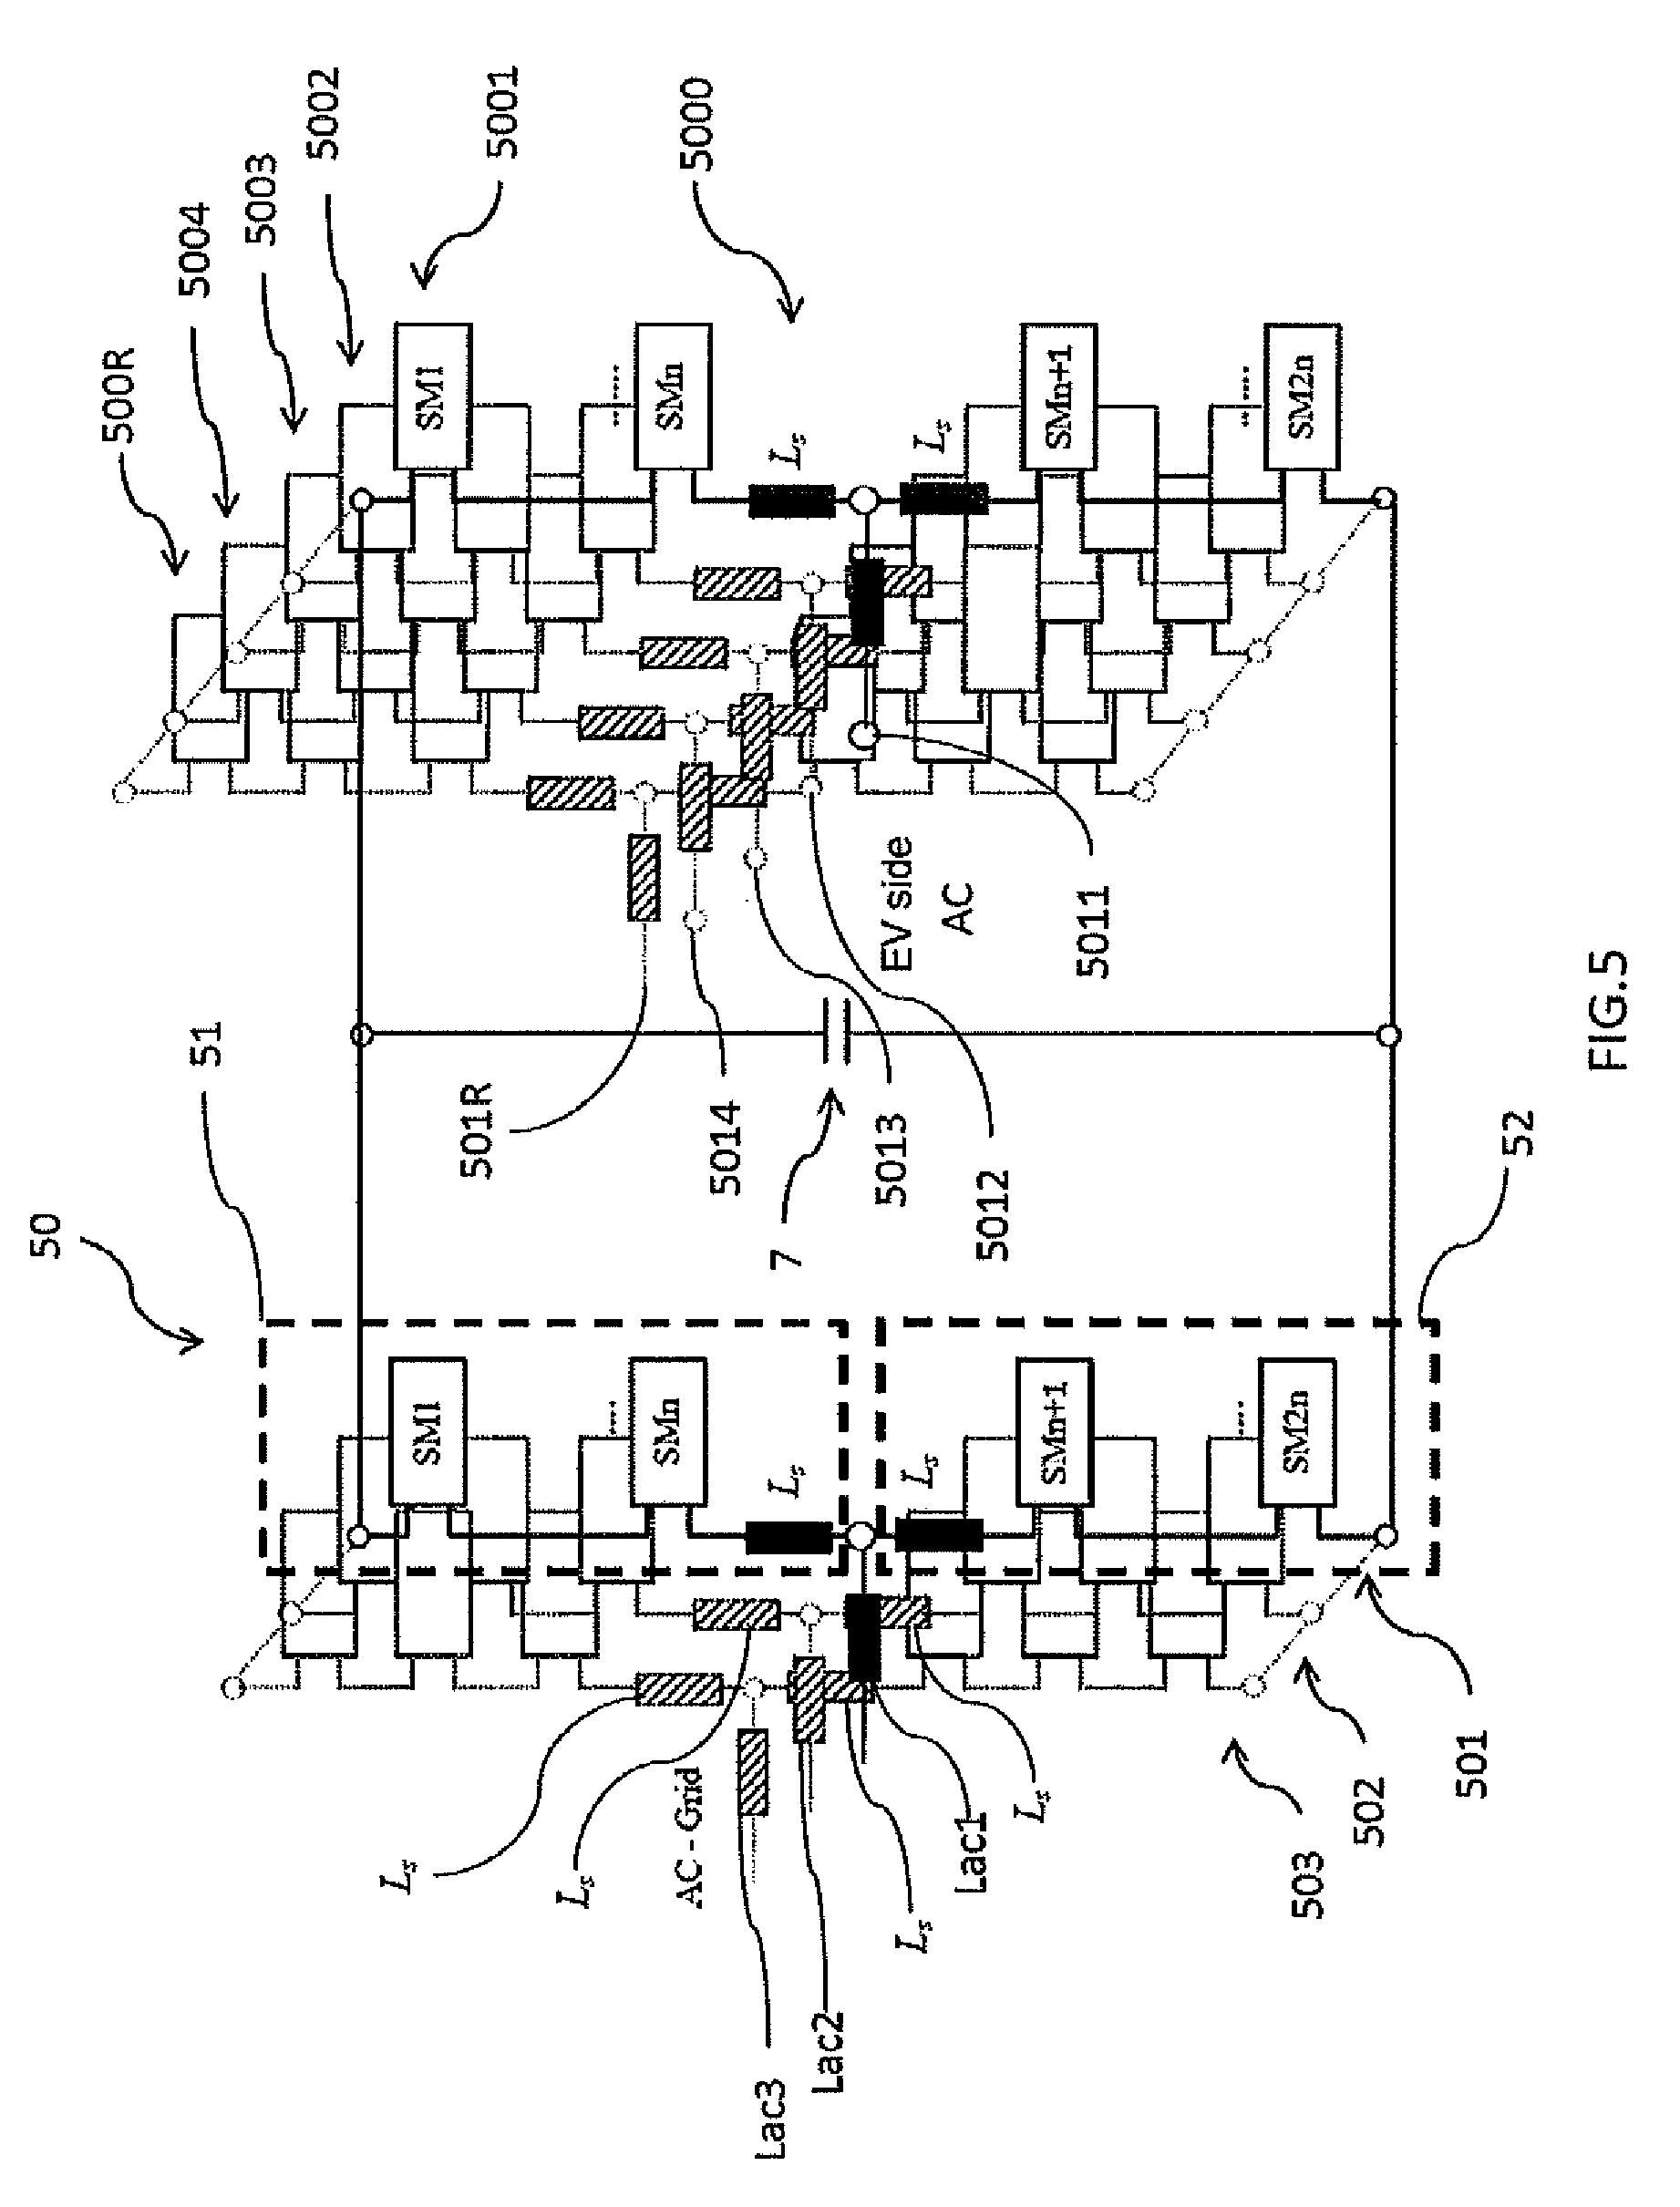 wiring diagram for rv generac np52g